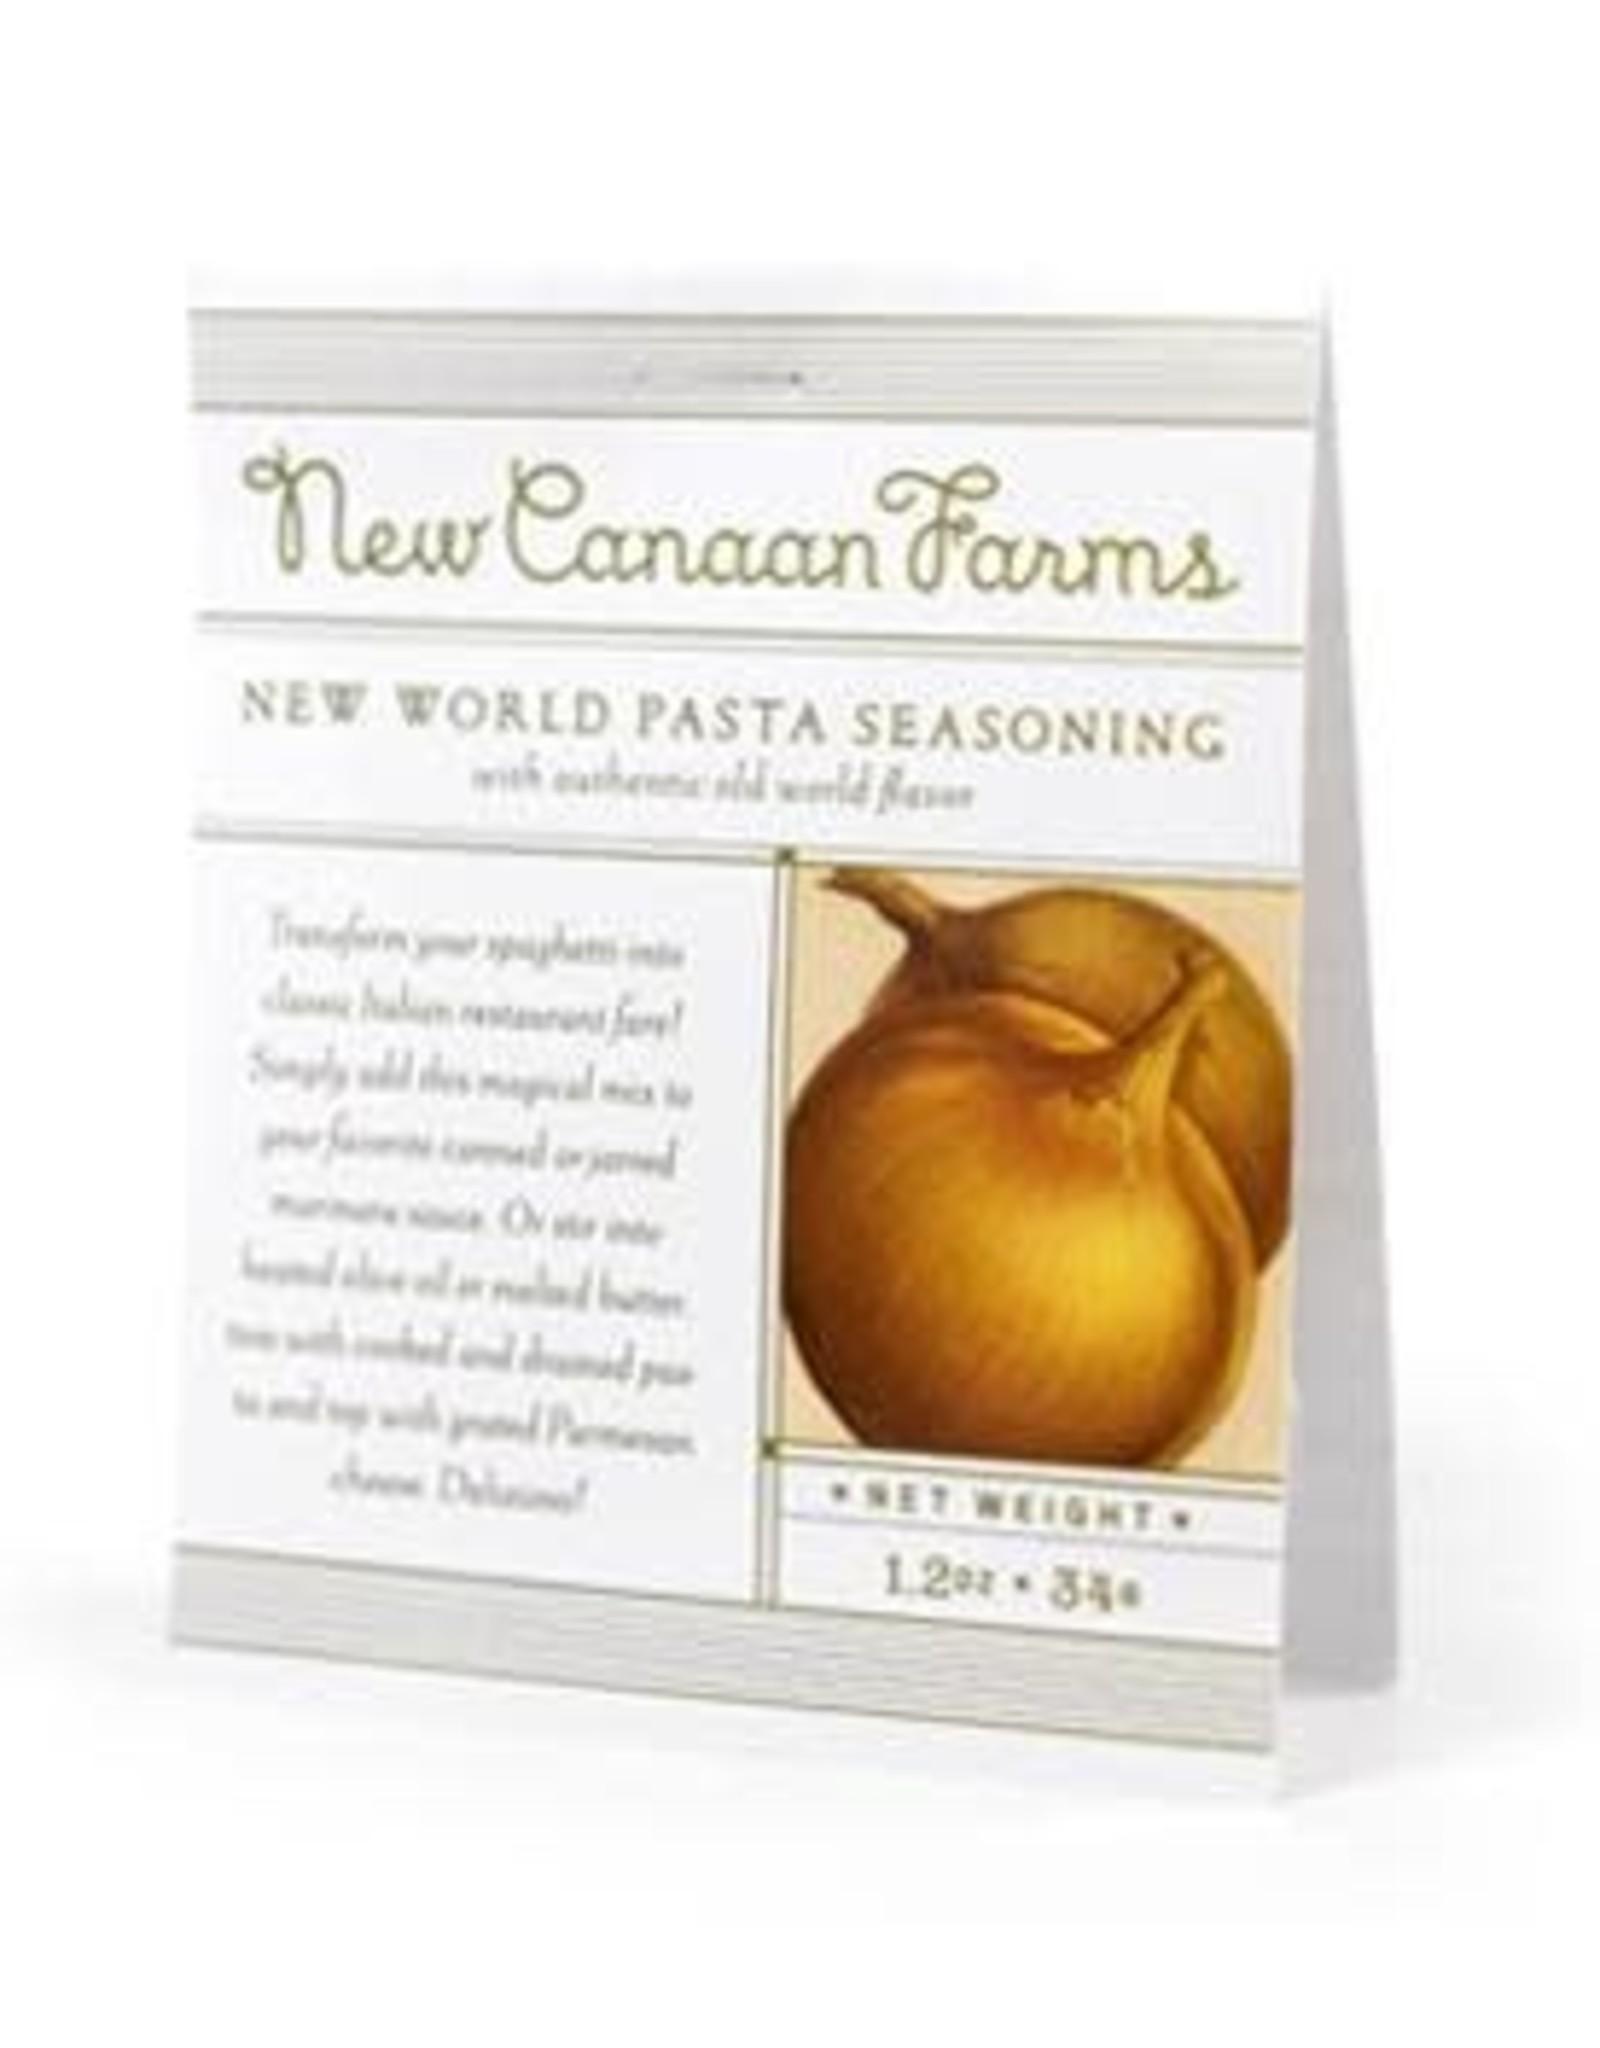 New World Pasta Seasoning